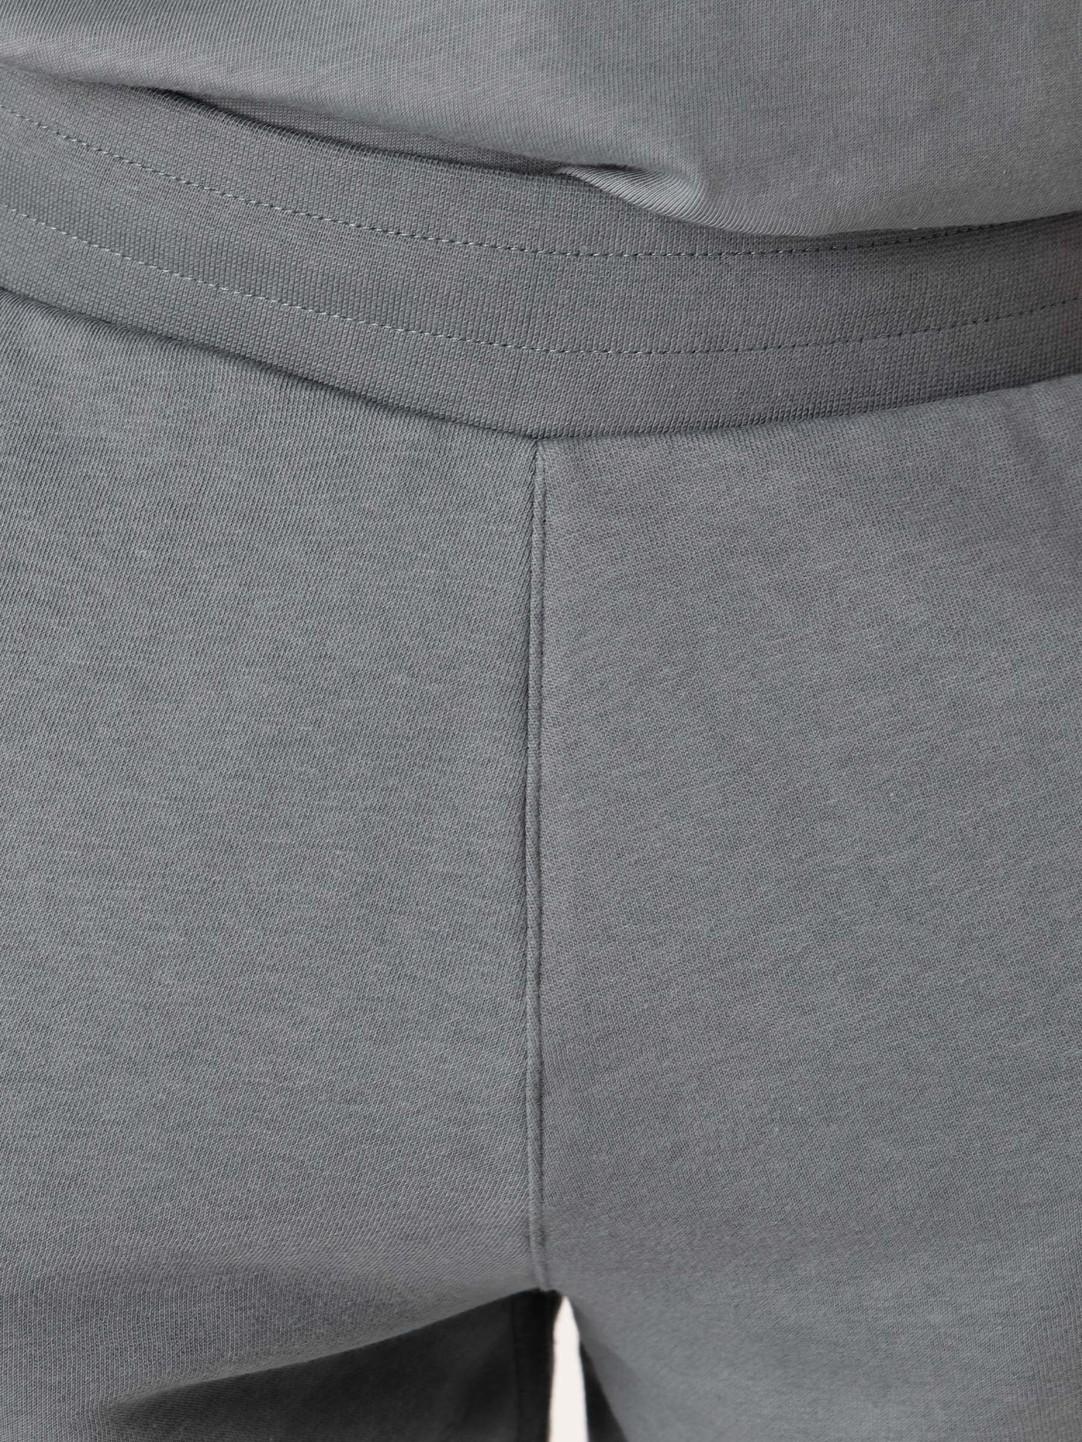 adidas adidas 3-Stripes Pant Blue Oxide GN3529